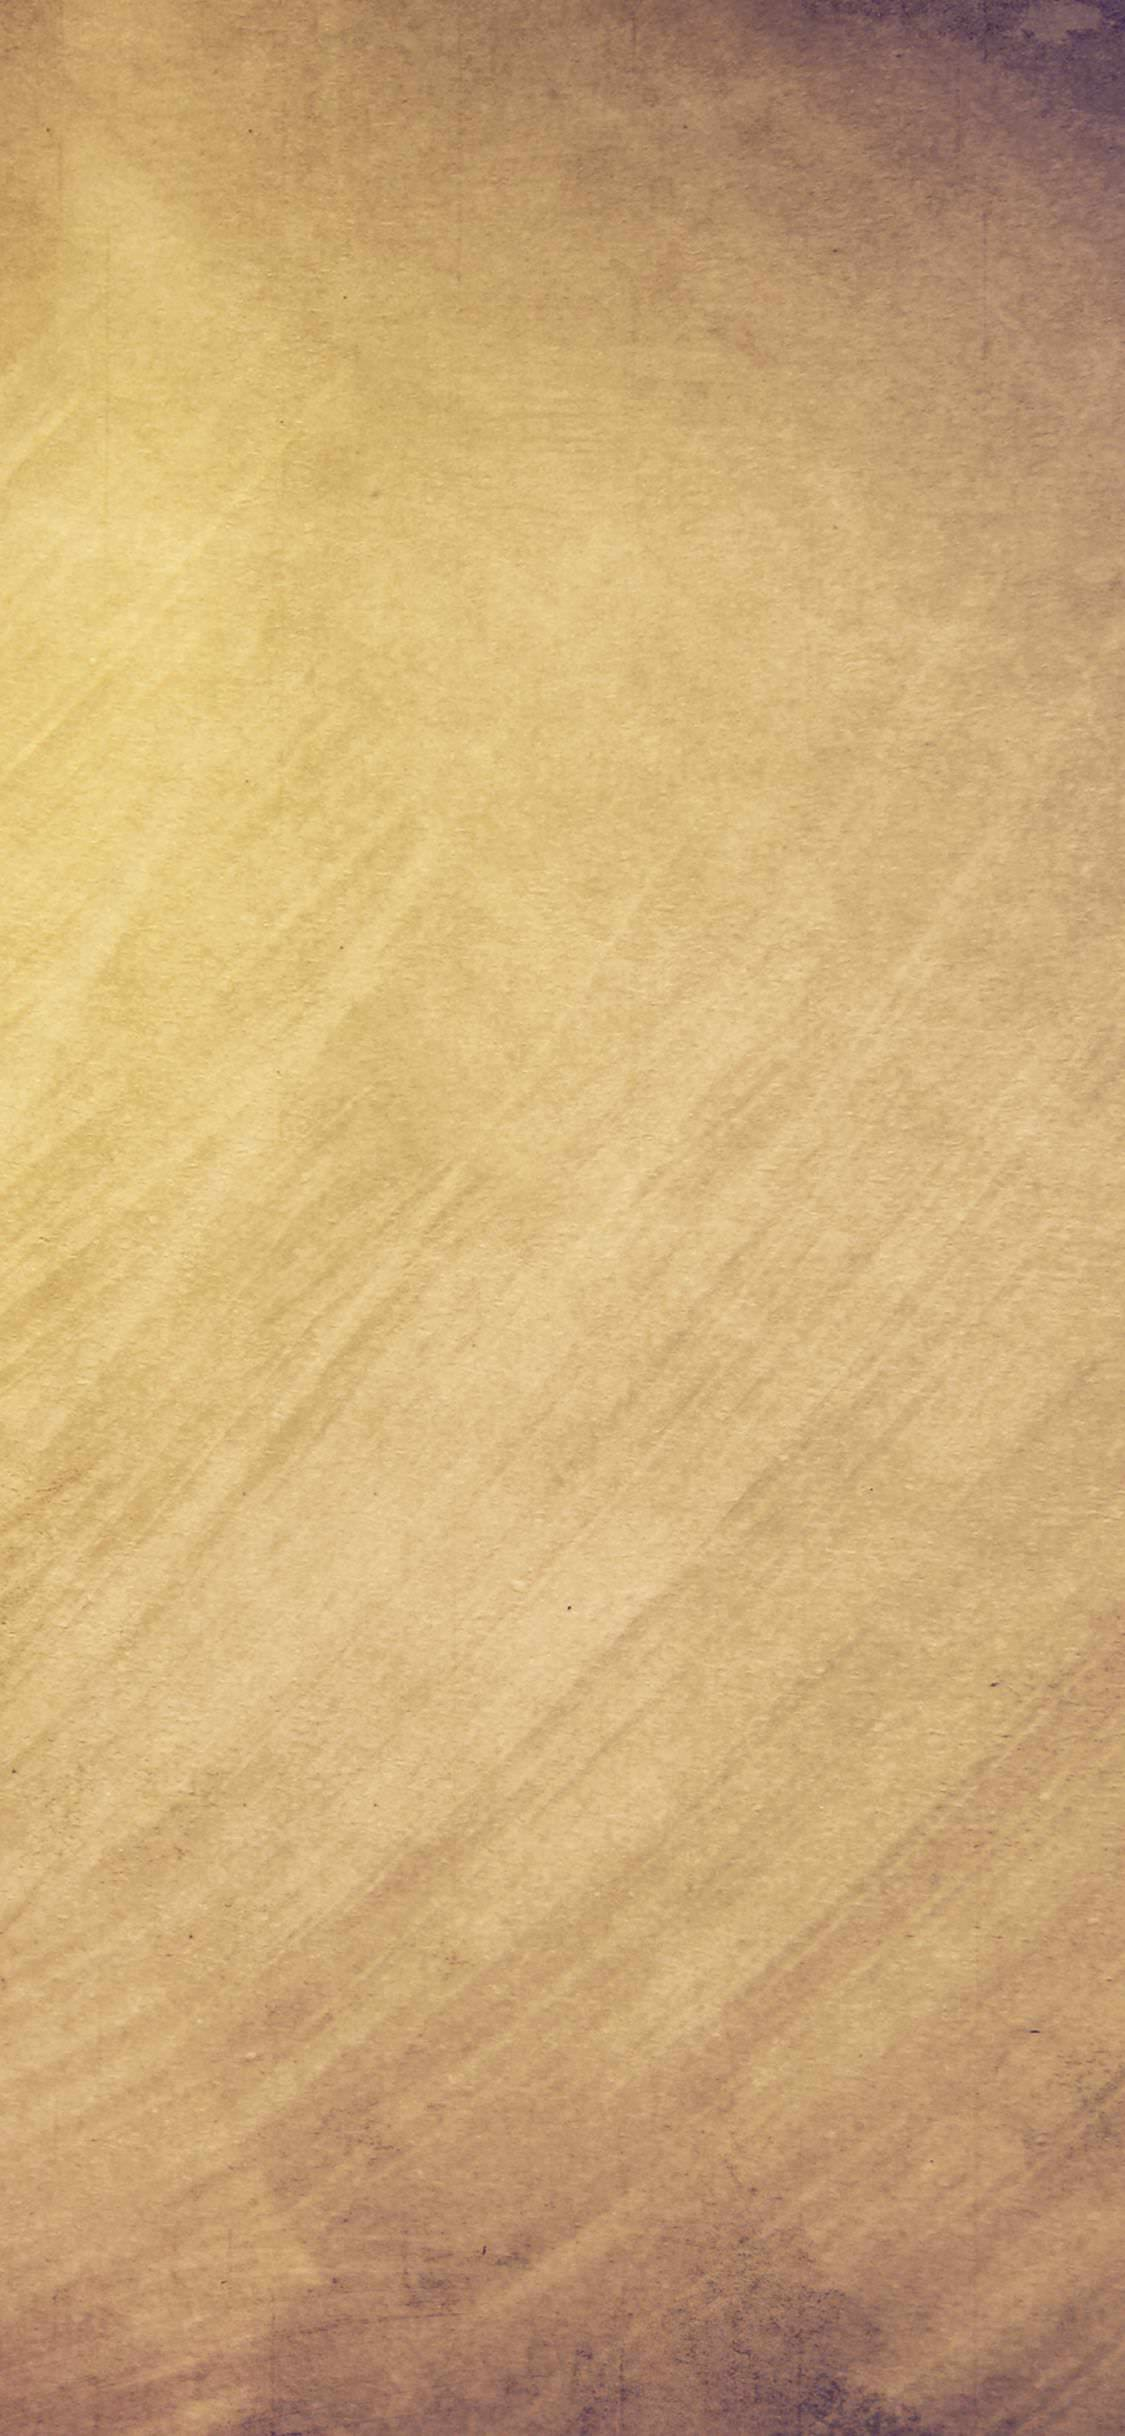 iPhone XS , iPhone X wallpaper 0909